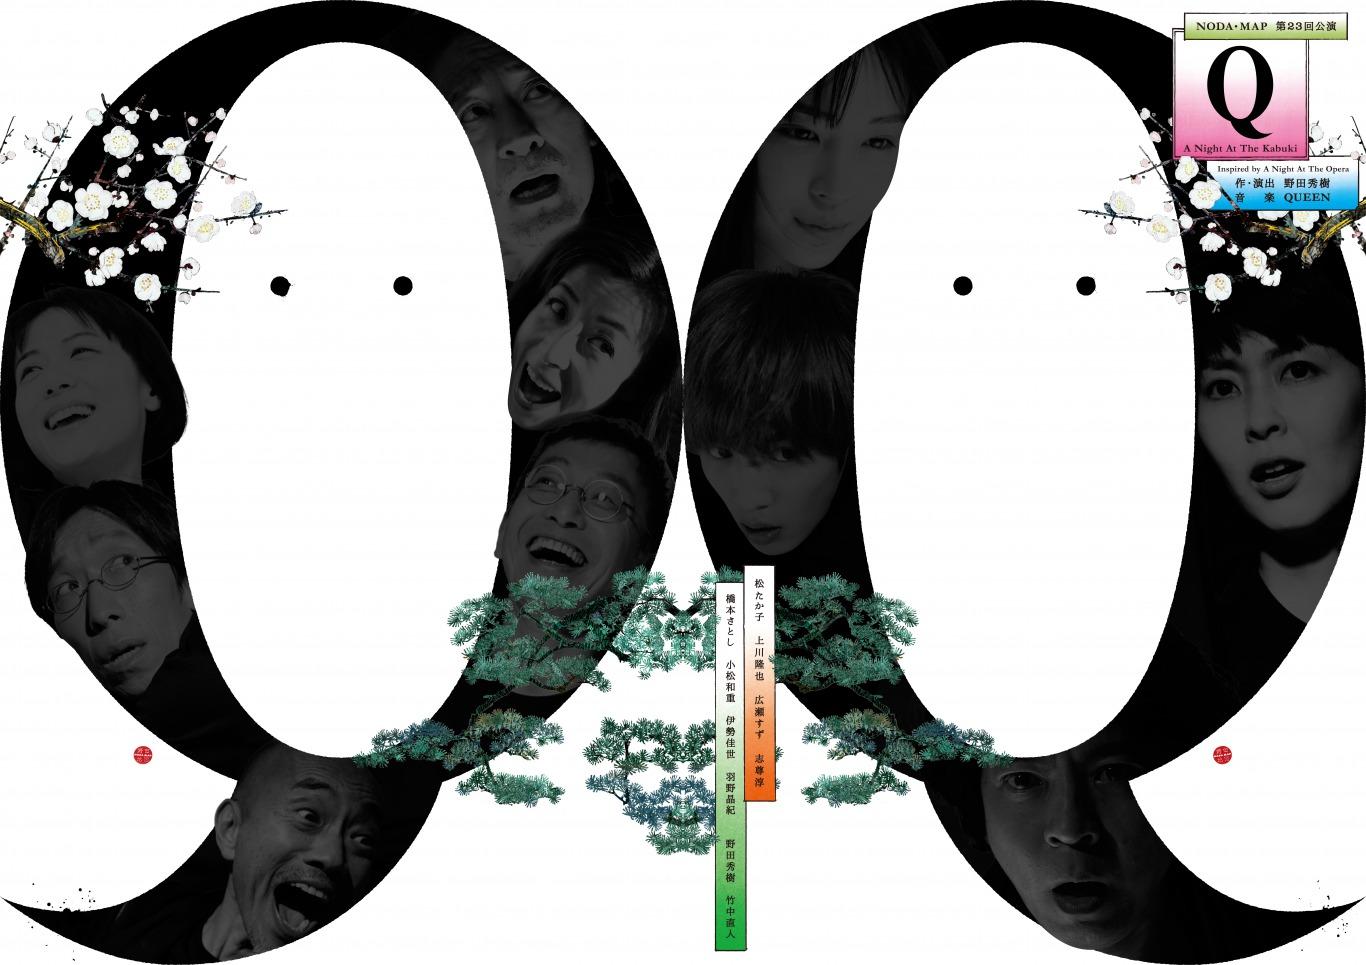 NODA・MAP 23rd performance 『Q』 :A Night At The Kabuki